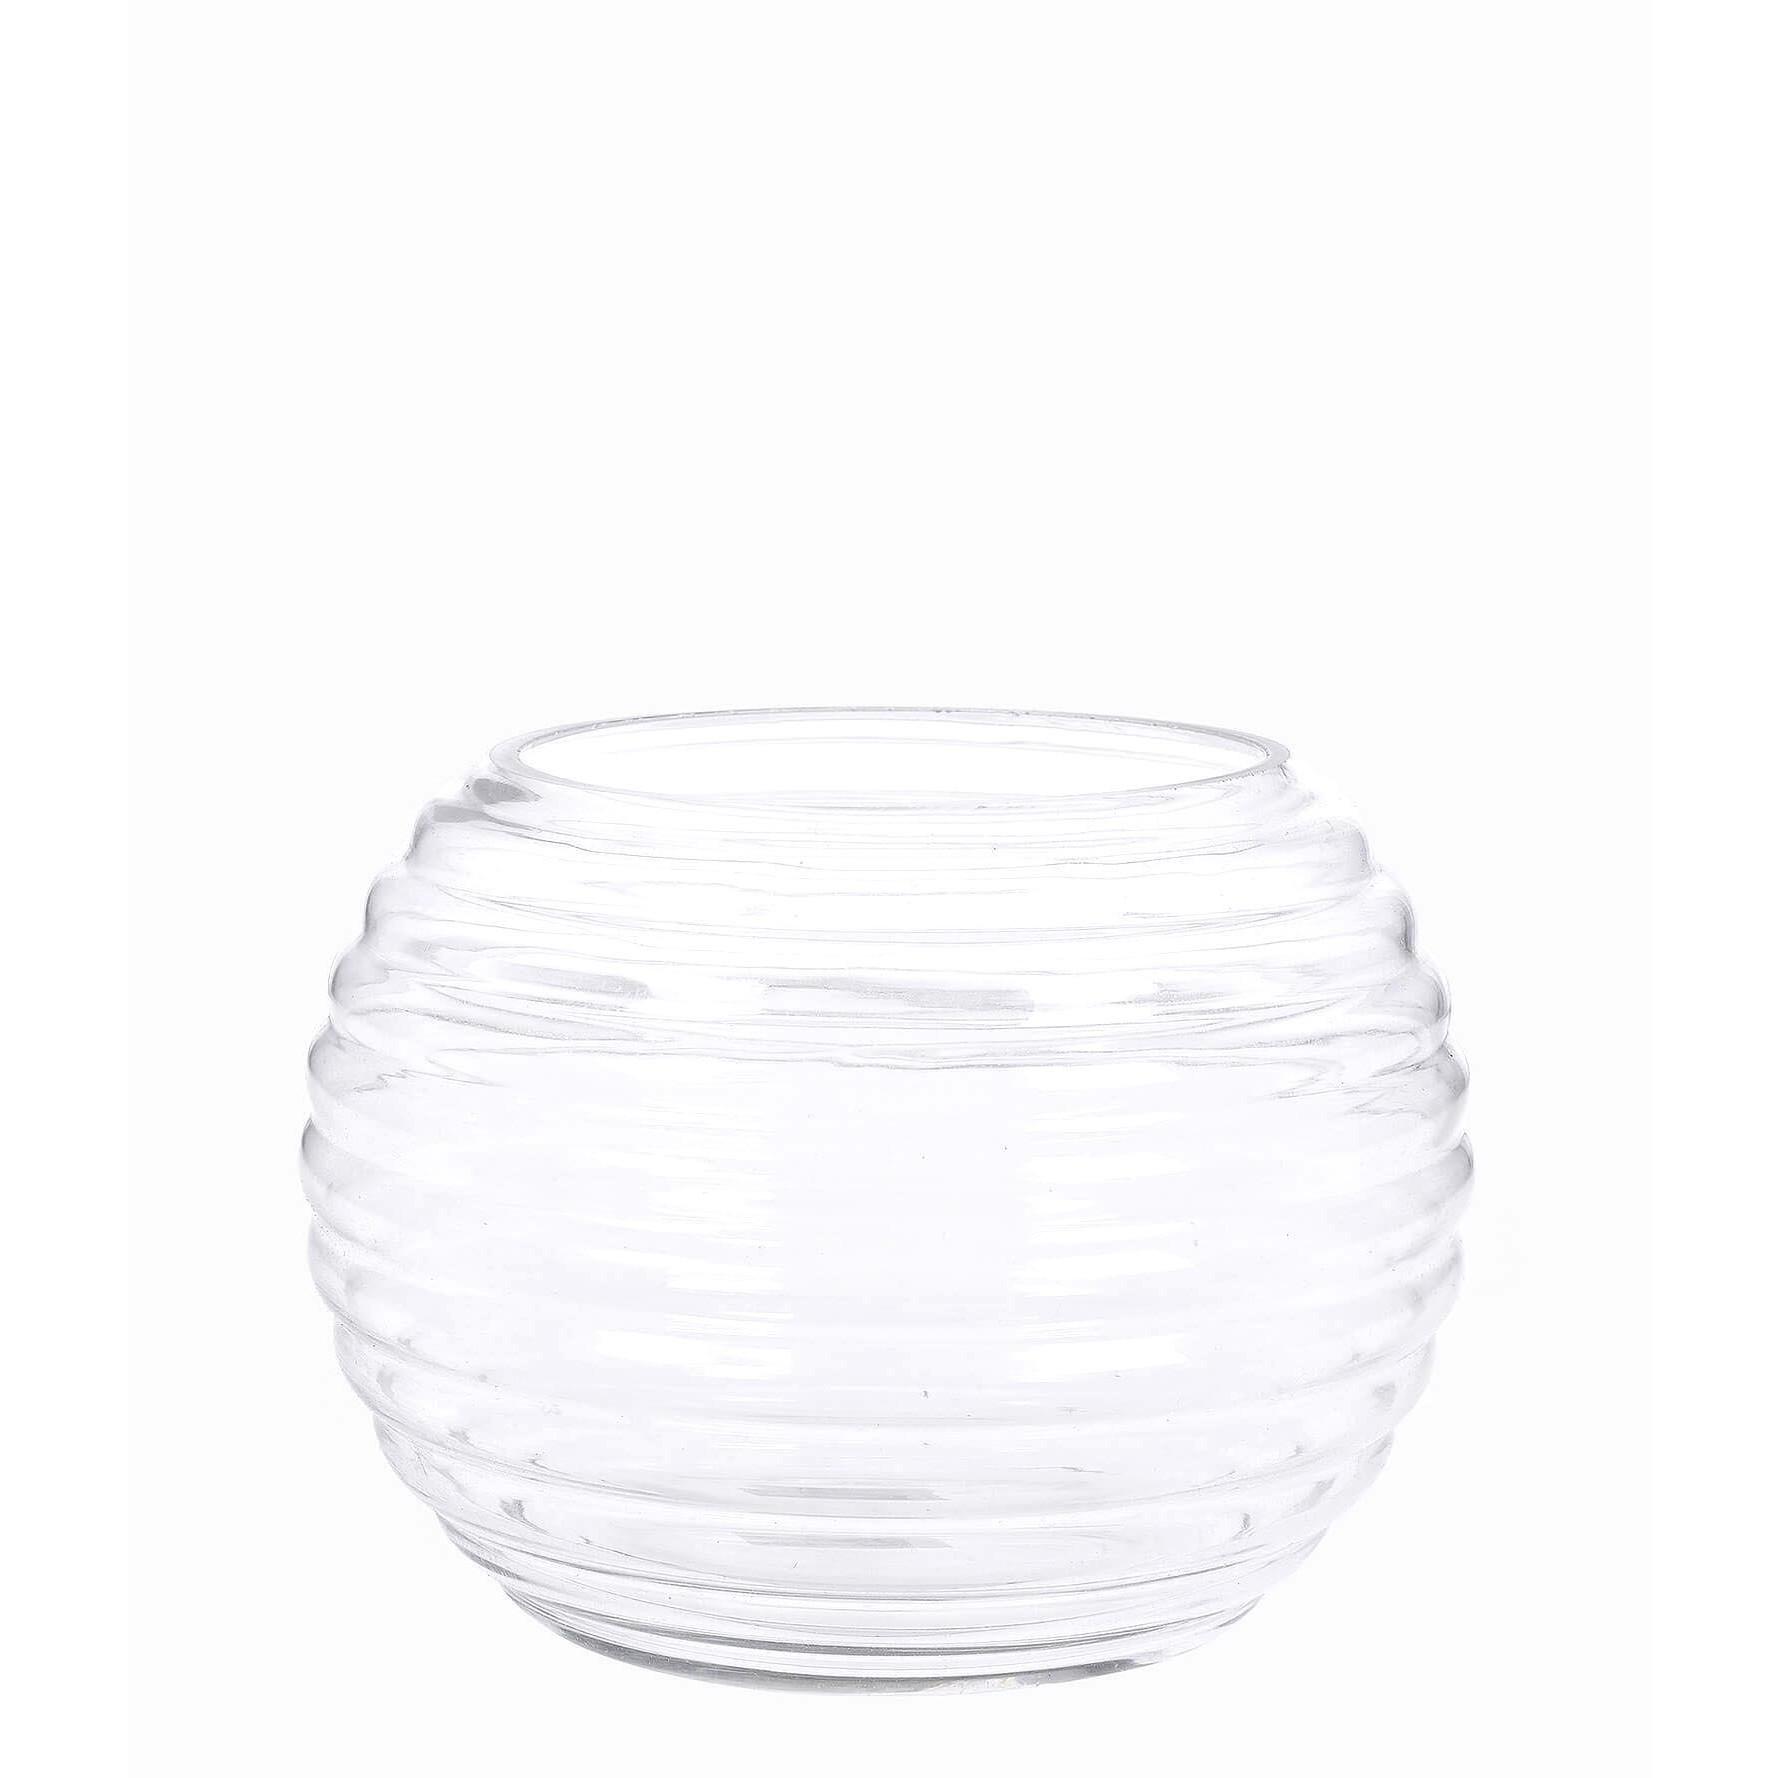 Vaso Decorativo de Vidro Aquario 12cm Transparente